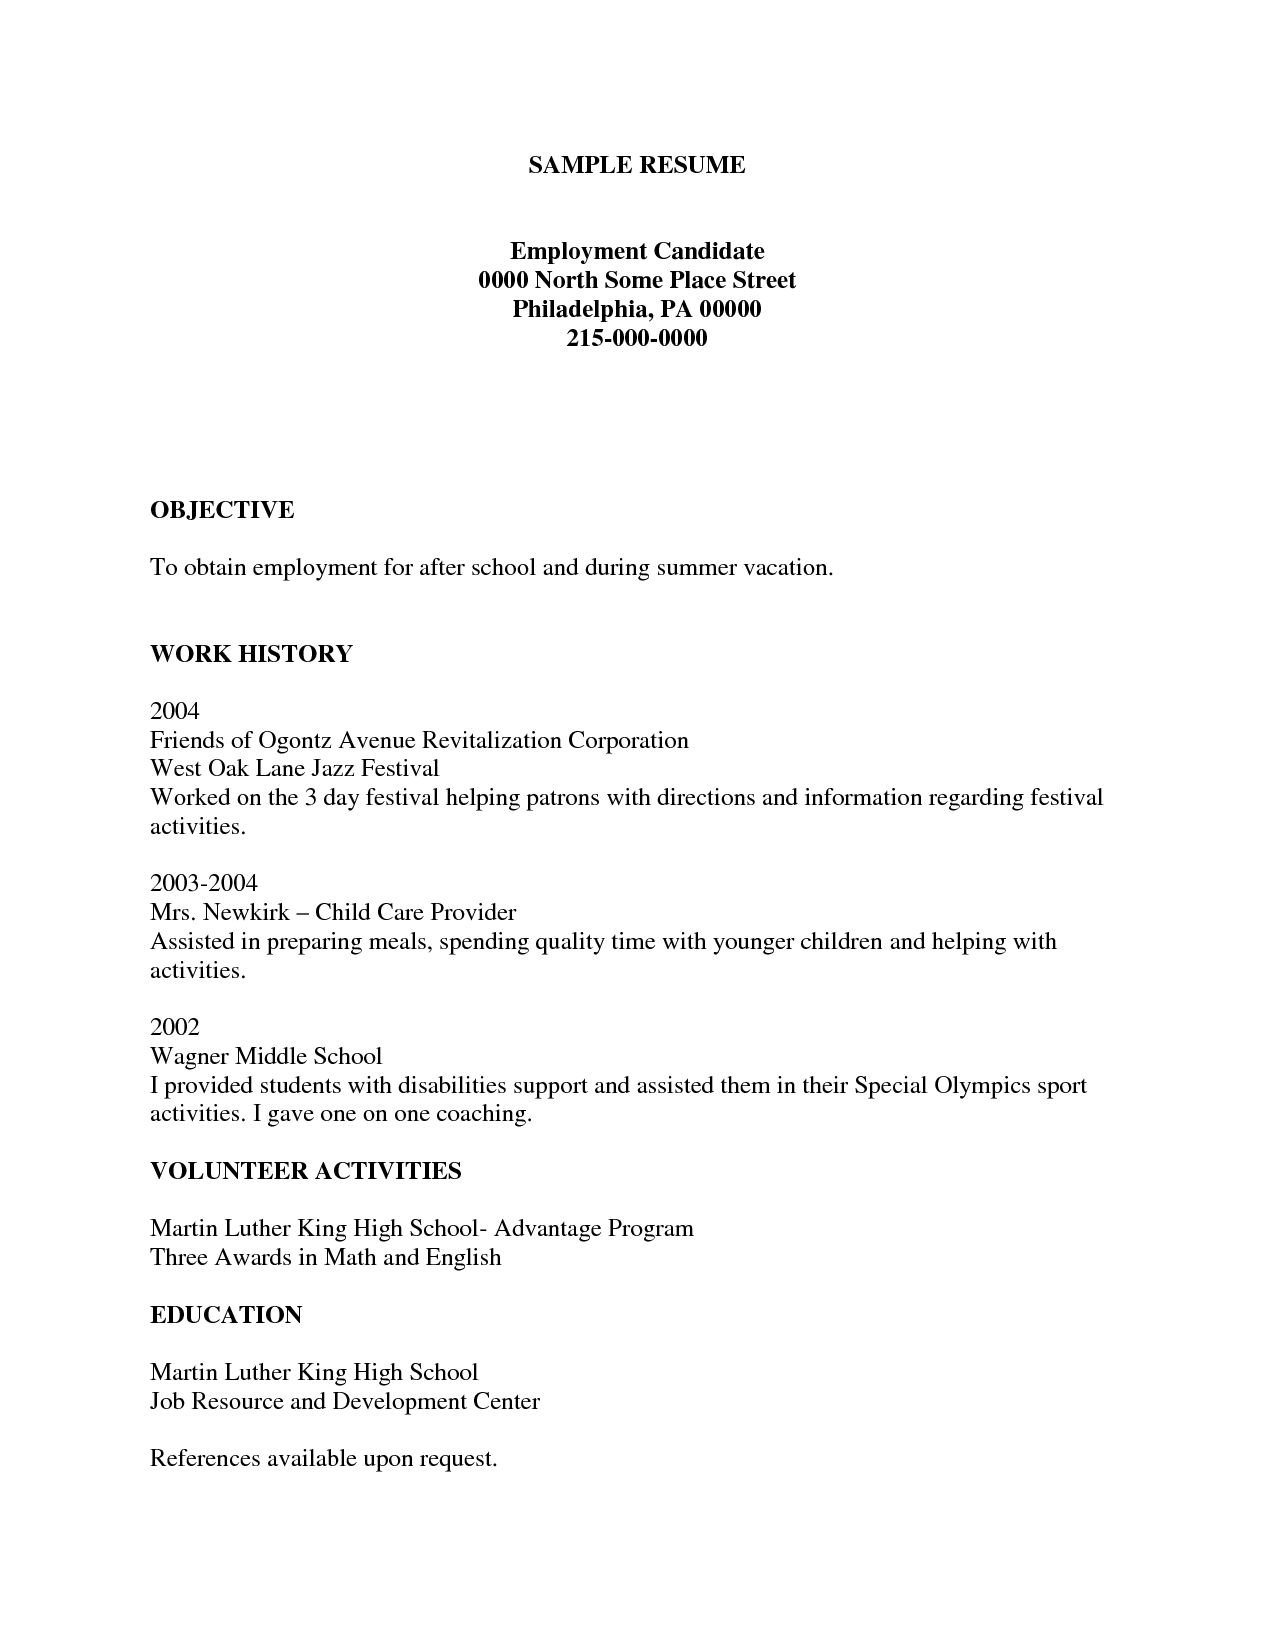 Resume Examples Printable Free Printable Resume Templates Downloadable Resume Template Student Resume Template